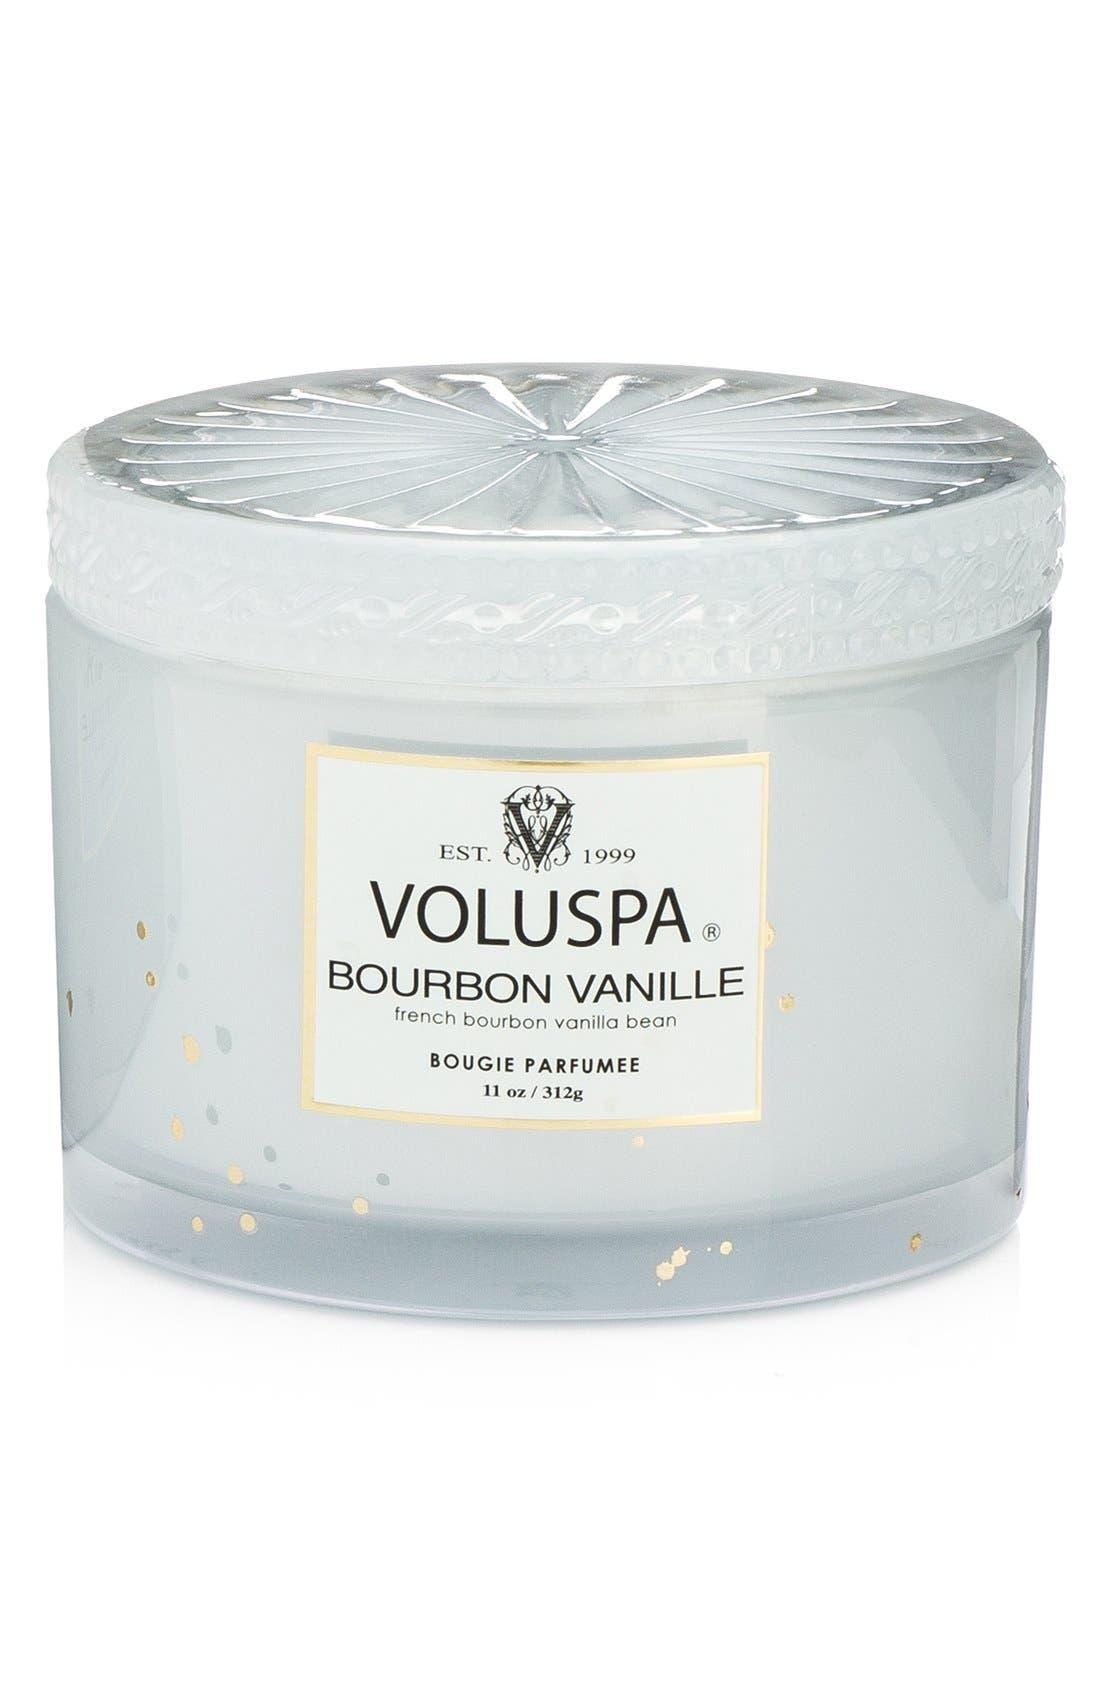 'Maison Blanc - Bourbon Vanille' Boxed Lidded Candle,                             Alternate thumbnail 2, color,                             000